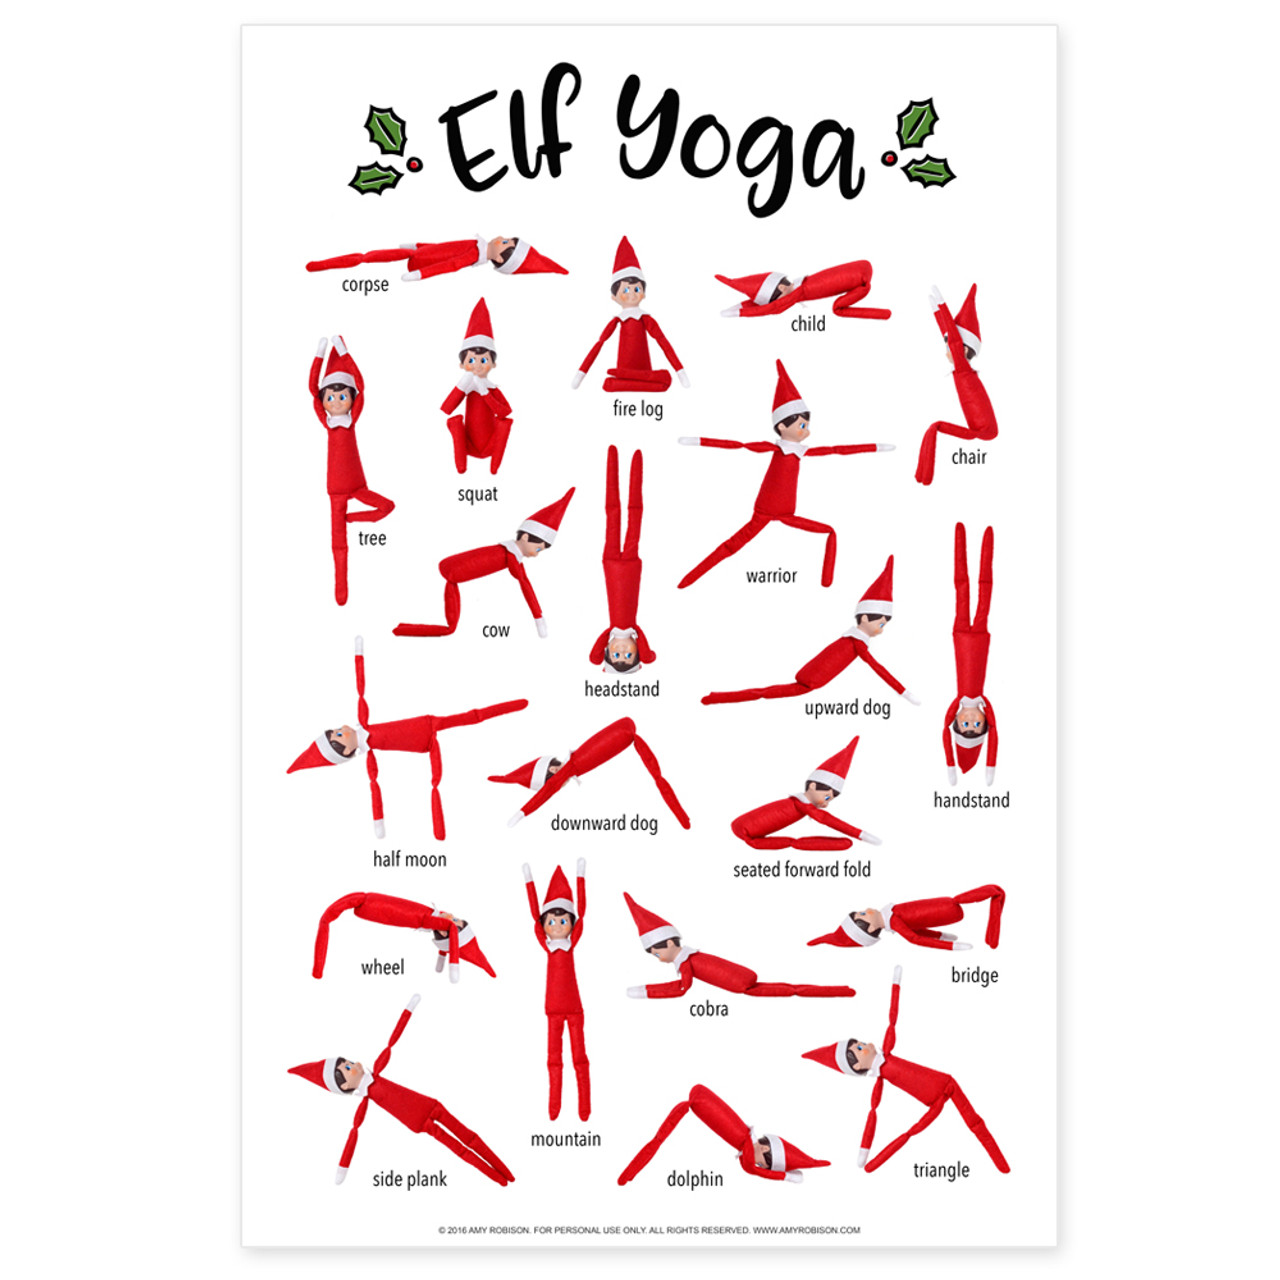 photo relating to Printable Elf named Elf Yoga Poster Printable